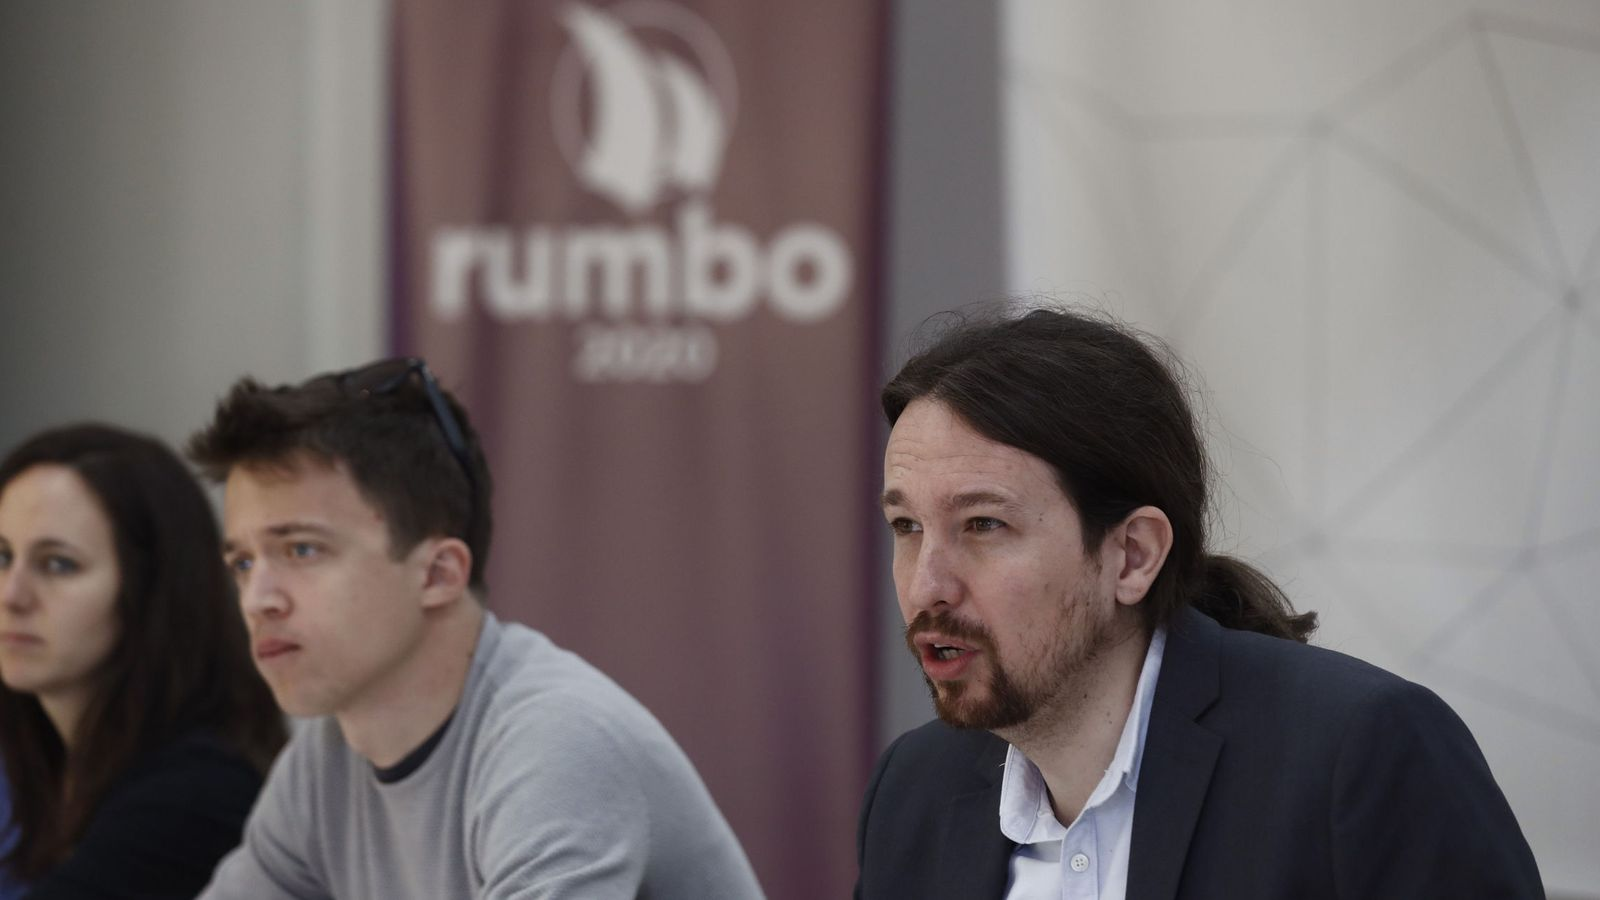 "Foto: Errejón e Iglesias en la reunión de ""Rumbo 2020"". (Emilio Naranjo/Efe)"